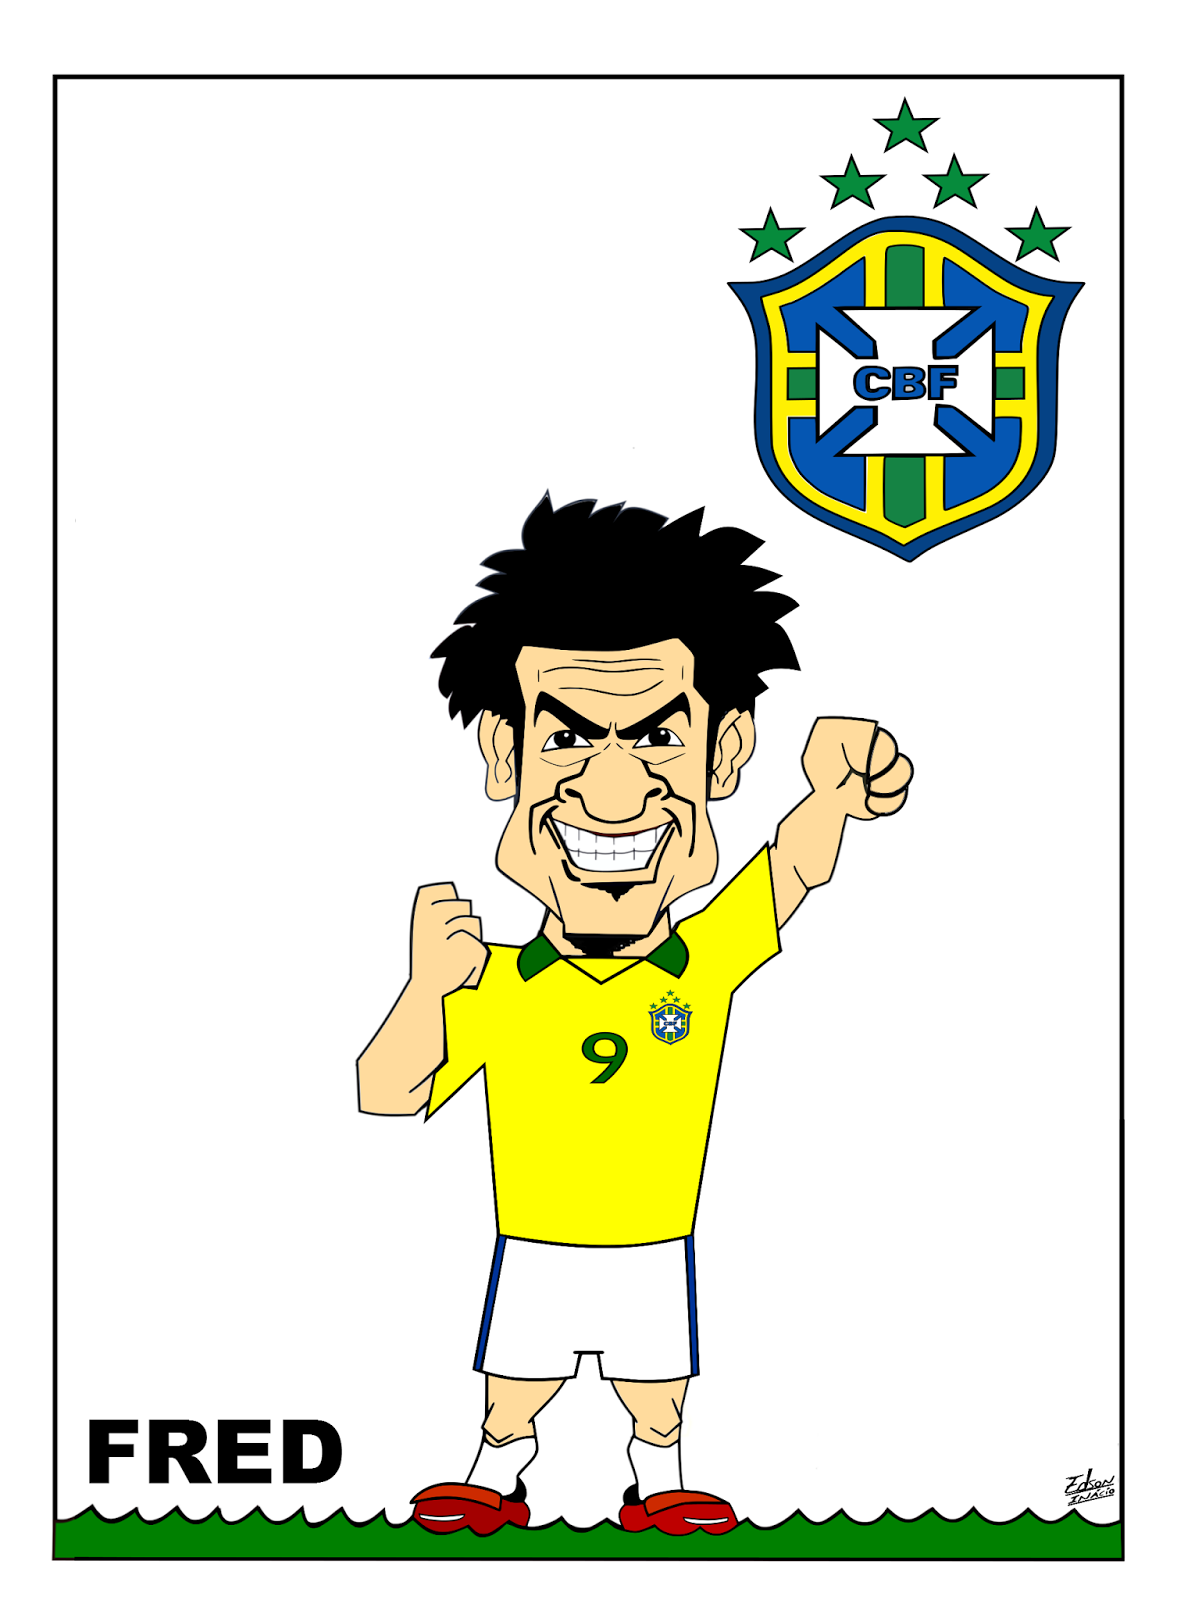 Mais informações no link   http   pt.wikipedia.org wiki Frederico Chaves Guedes feb033bdb4775